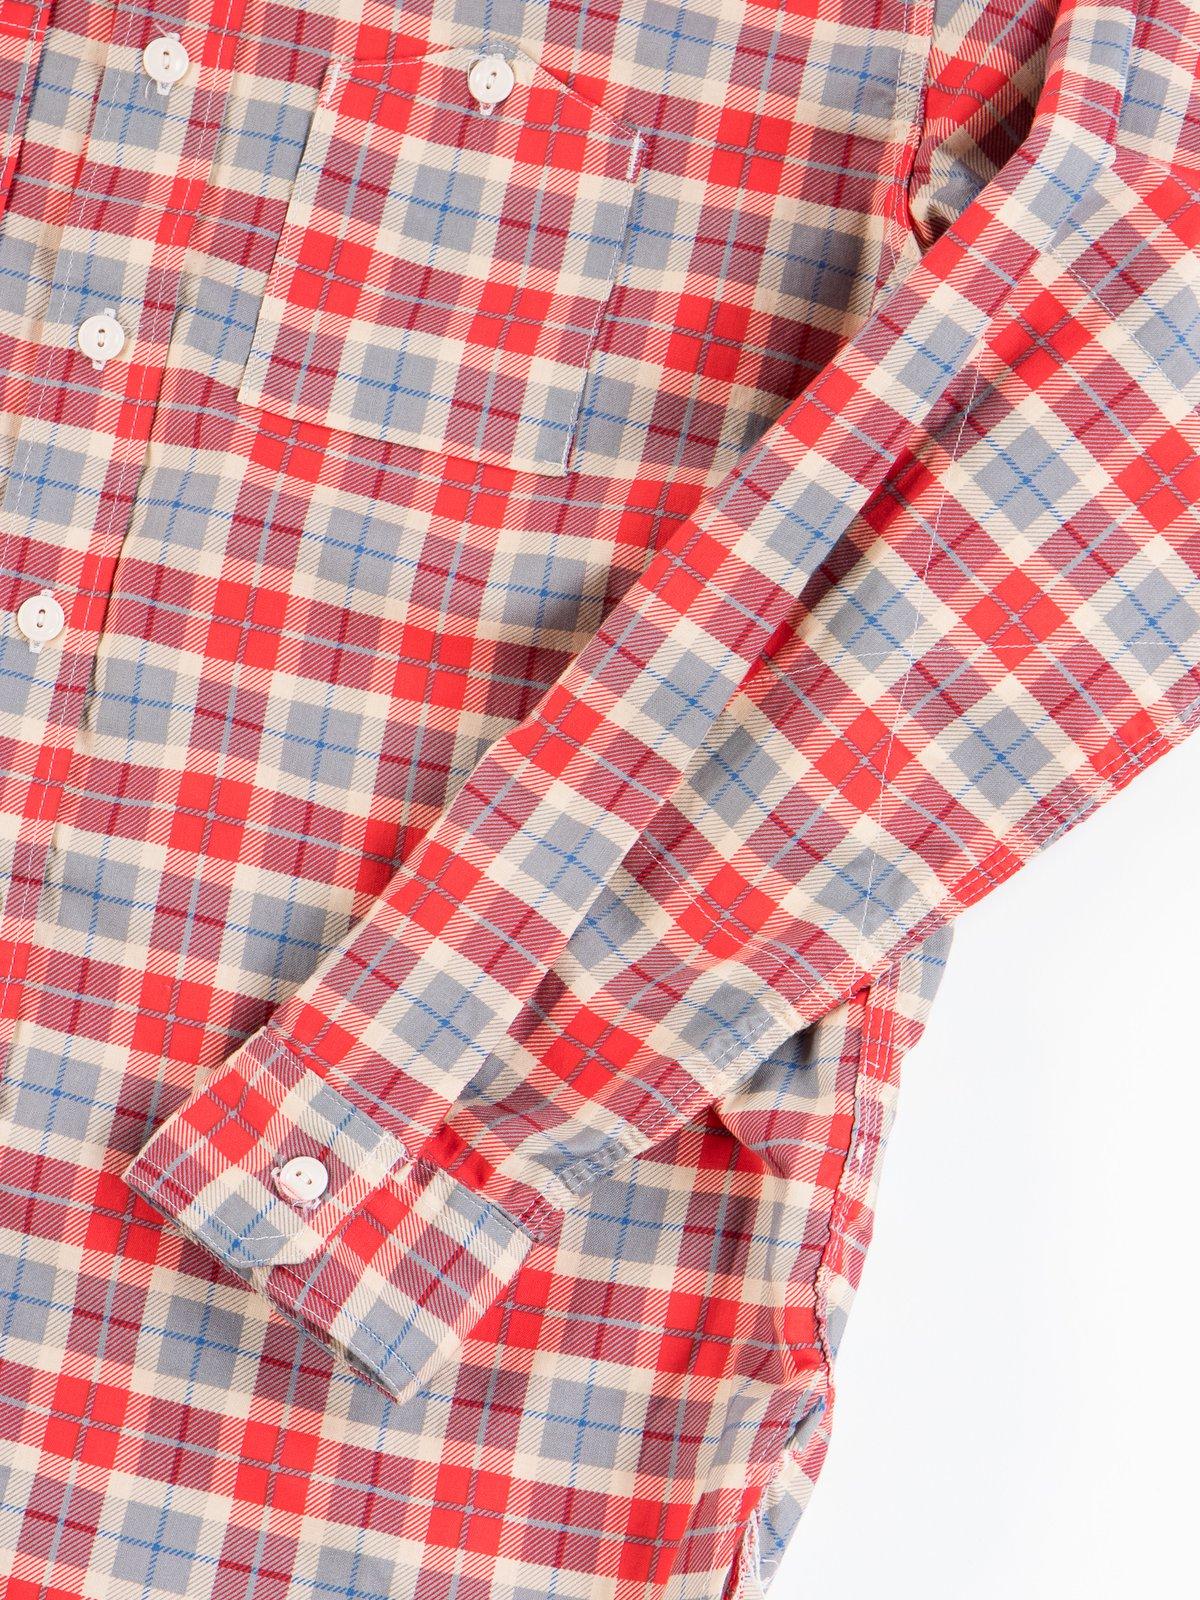 Red/Beige Cotton Printed Plaid Work Shirt - Image 5